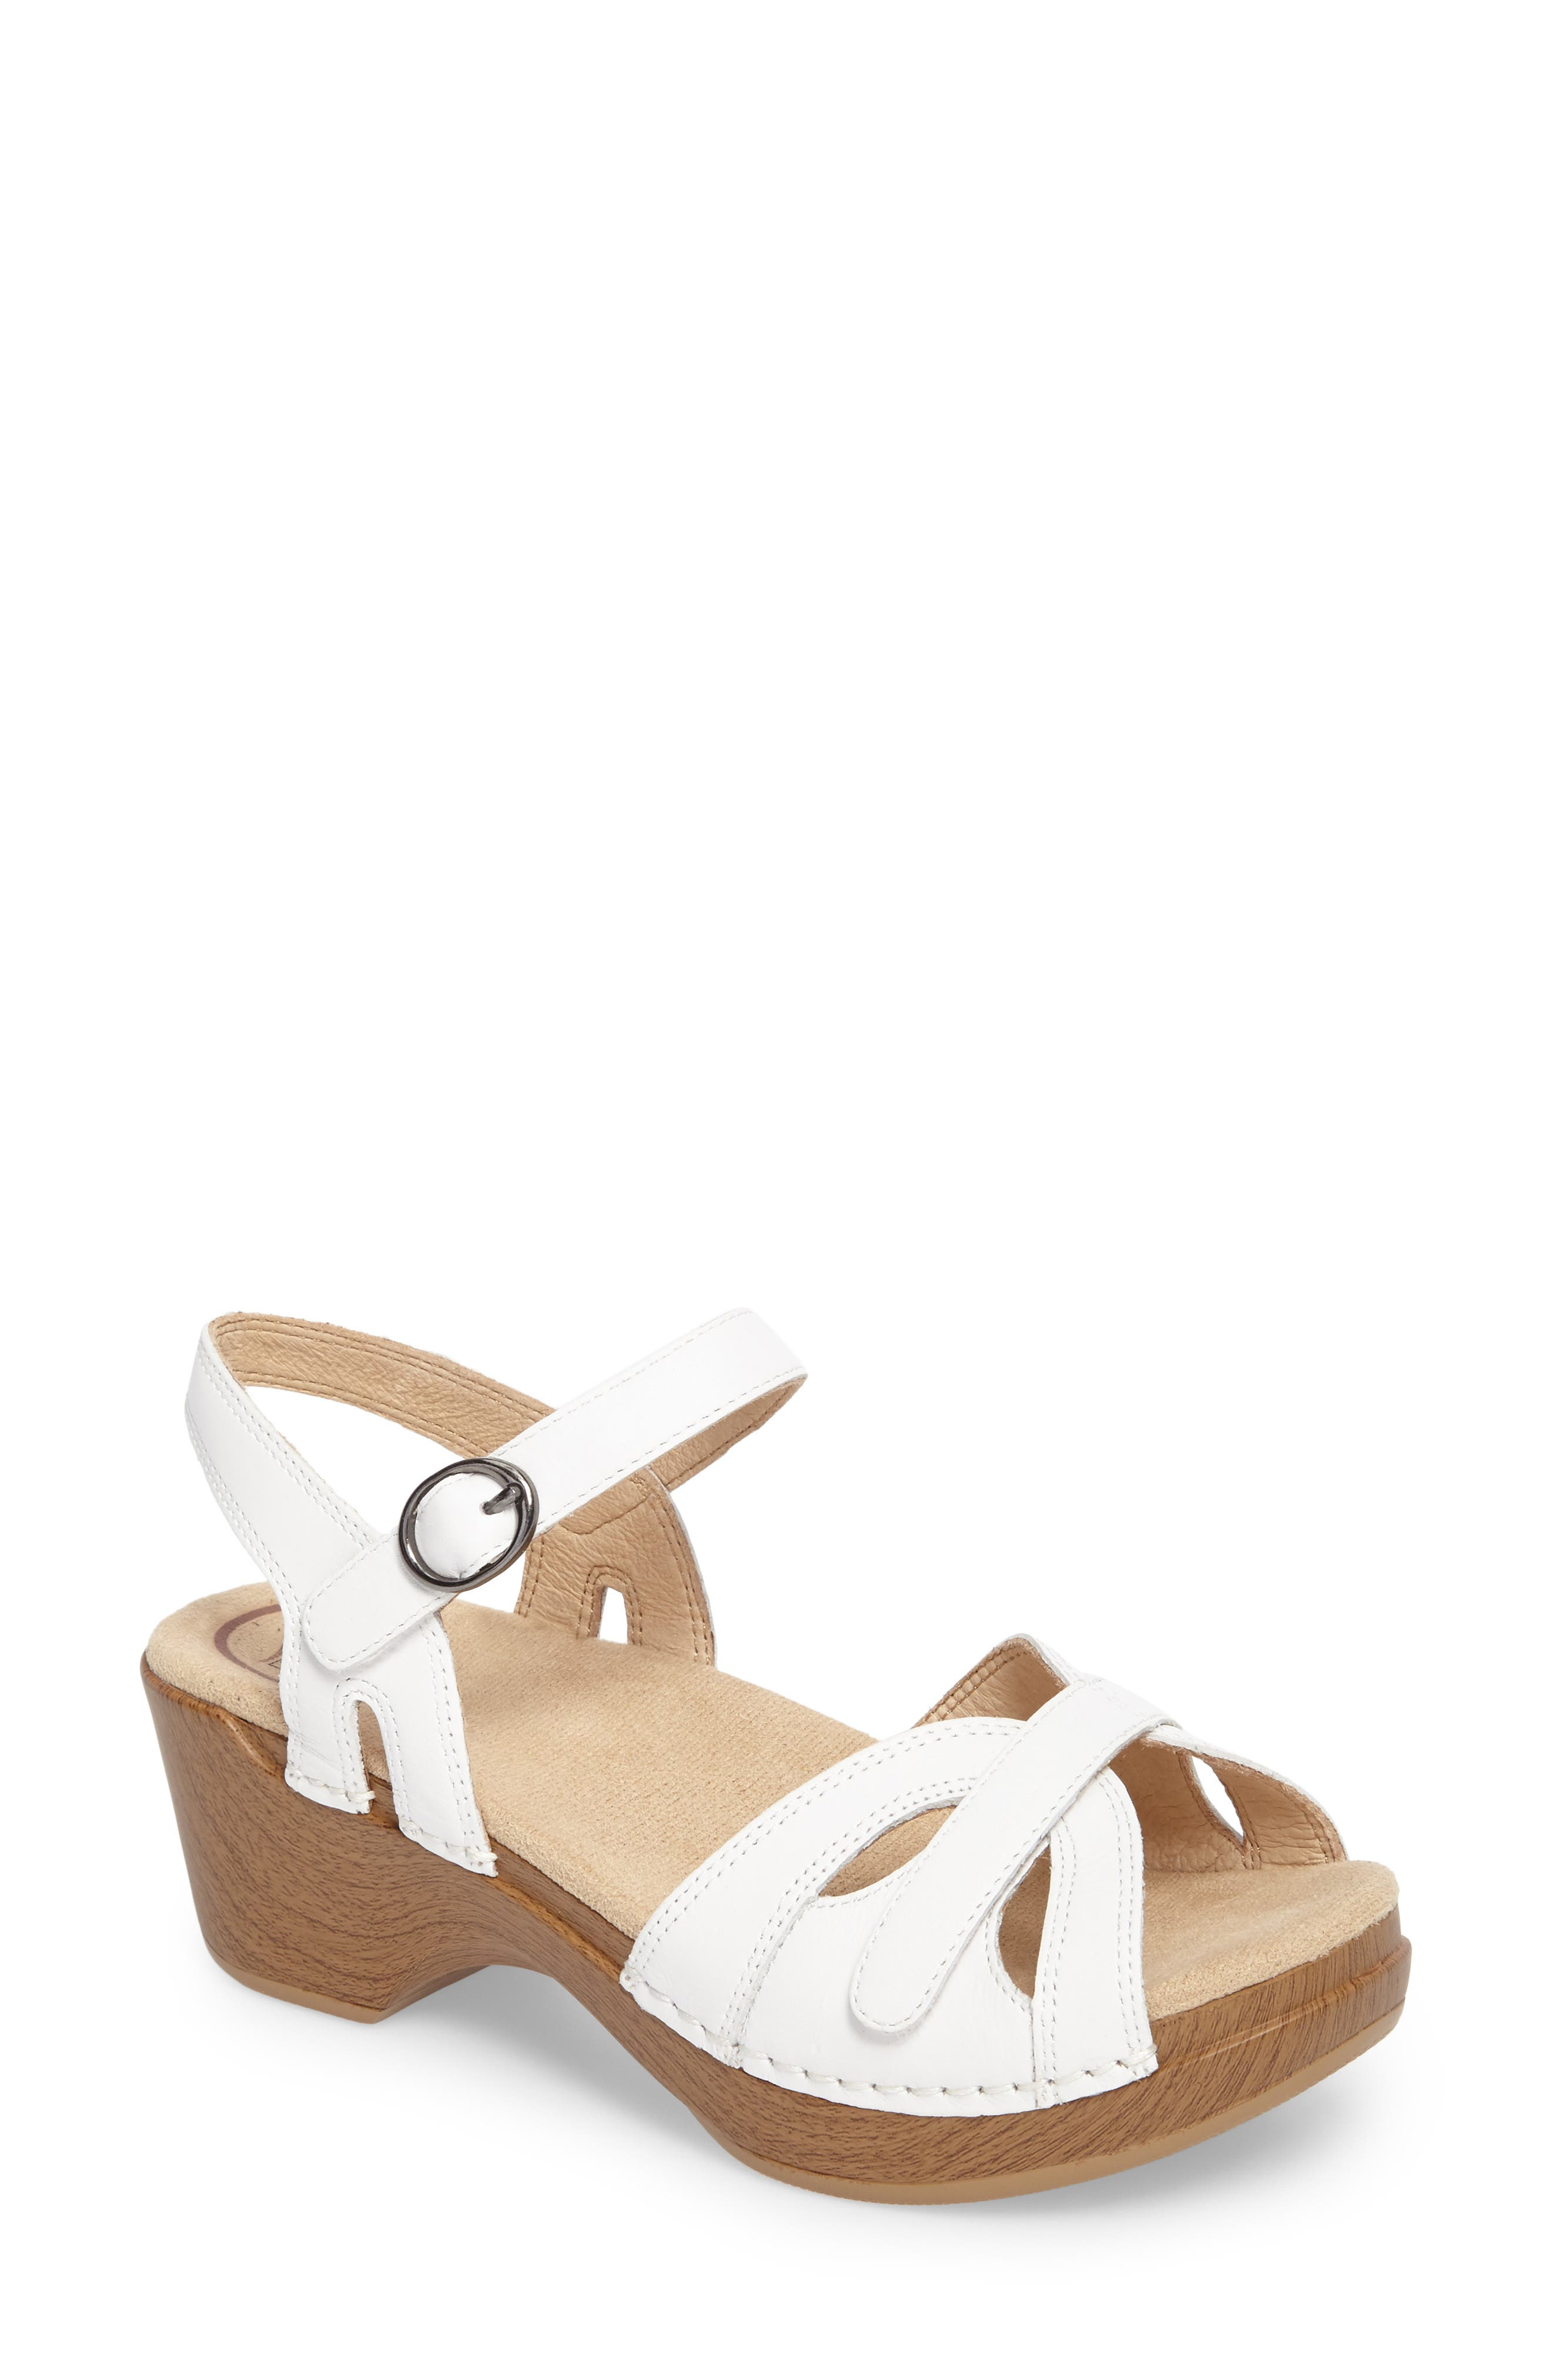 Season Sandal,                             Main thumbnail 1, color,                             White Leather